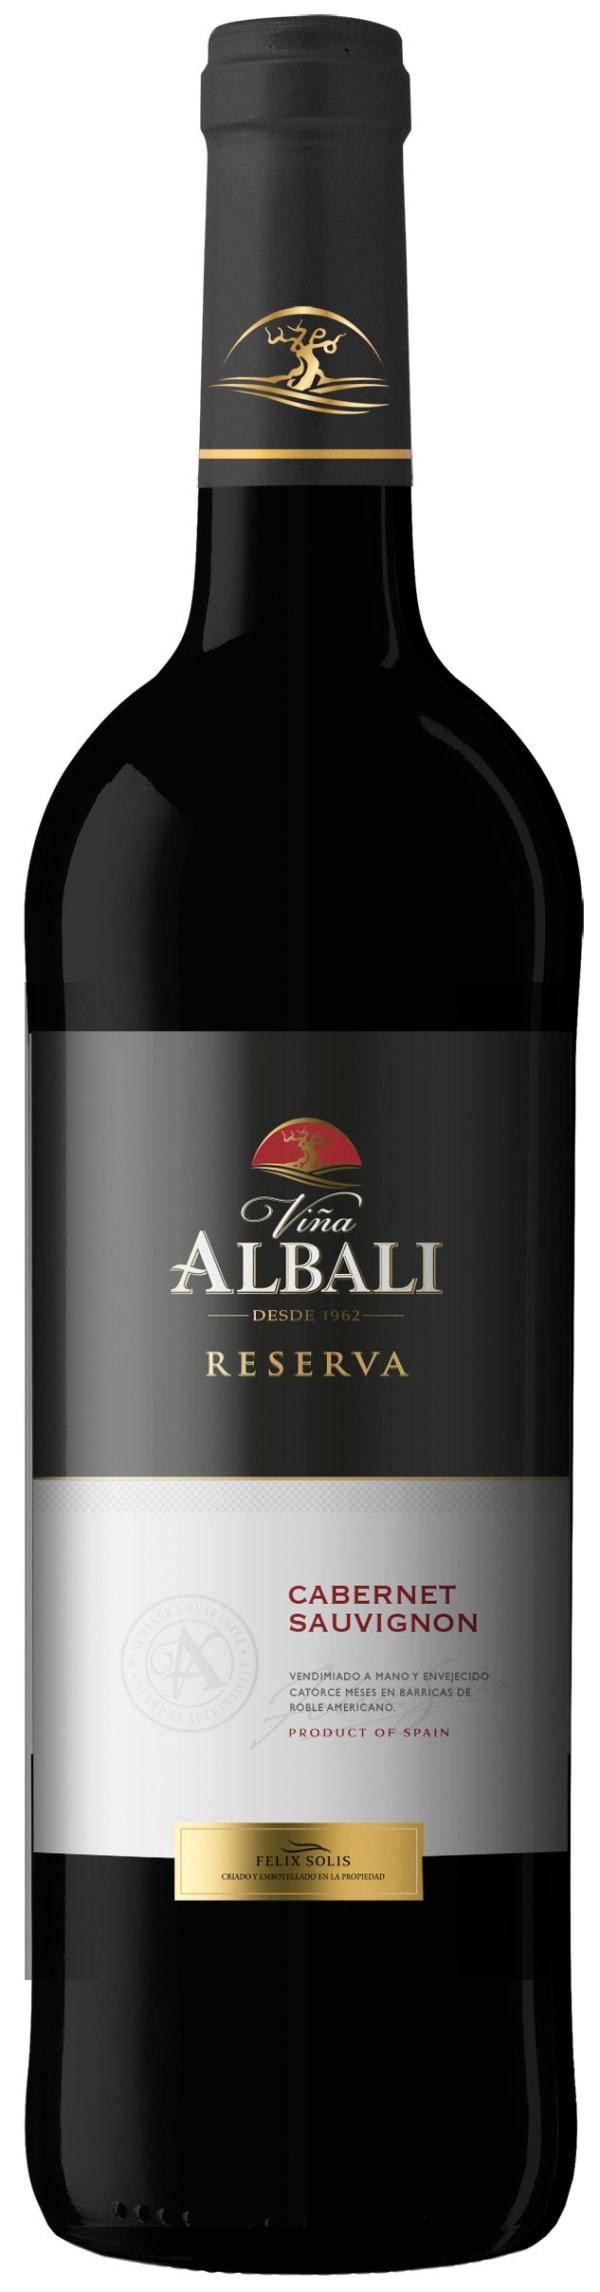 Viña Albali Cabernet Sauvignon Reserva 2012